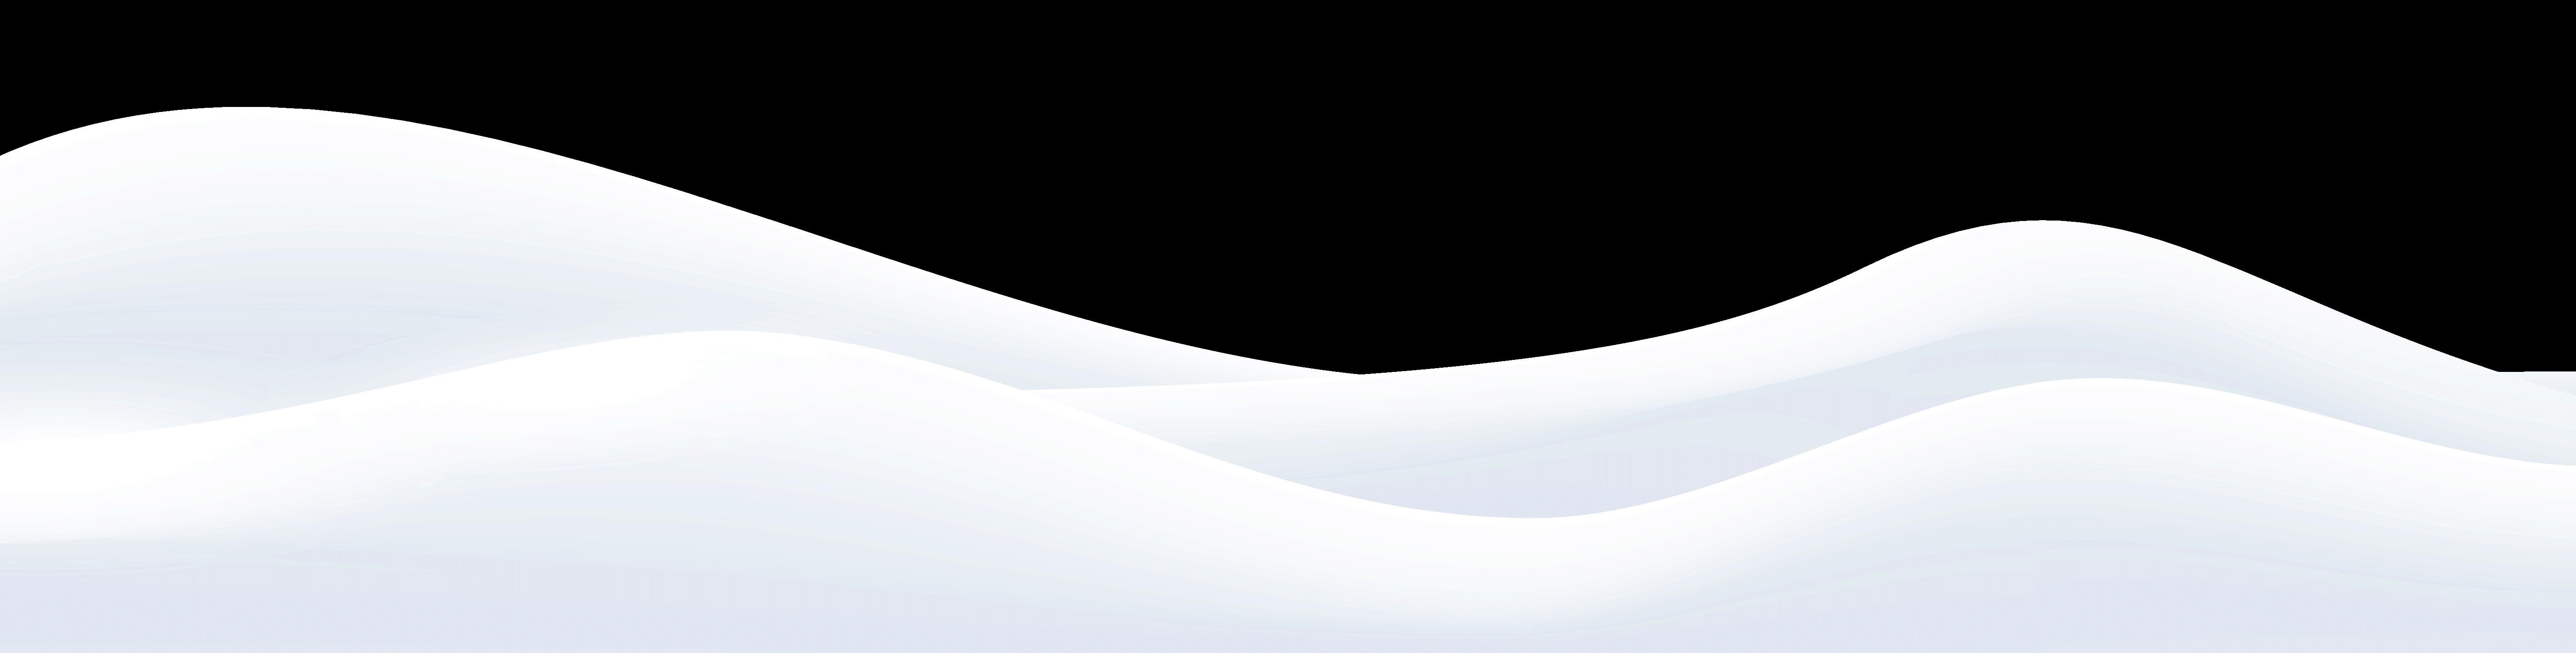 Free Snowy Bush Cliparts, Download Free Clip Art, Free Clip.